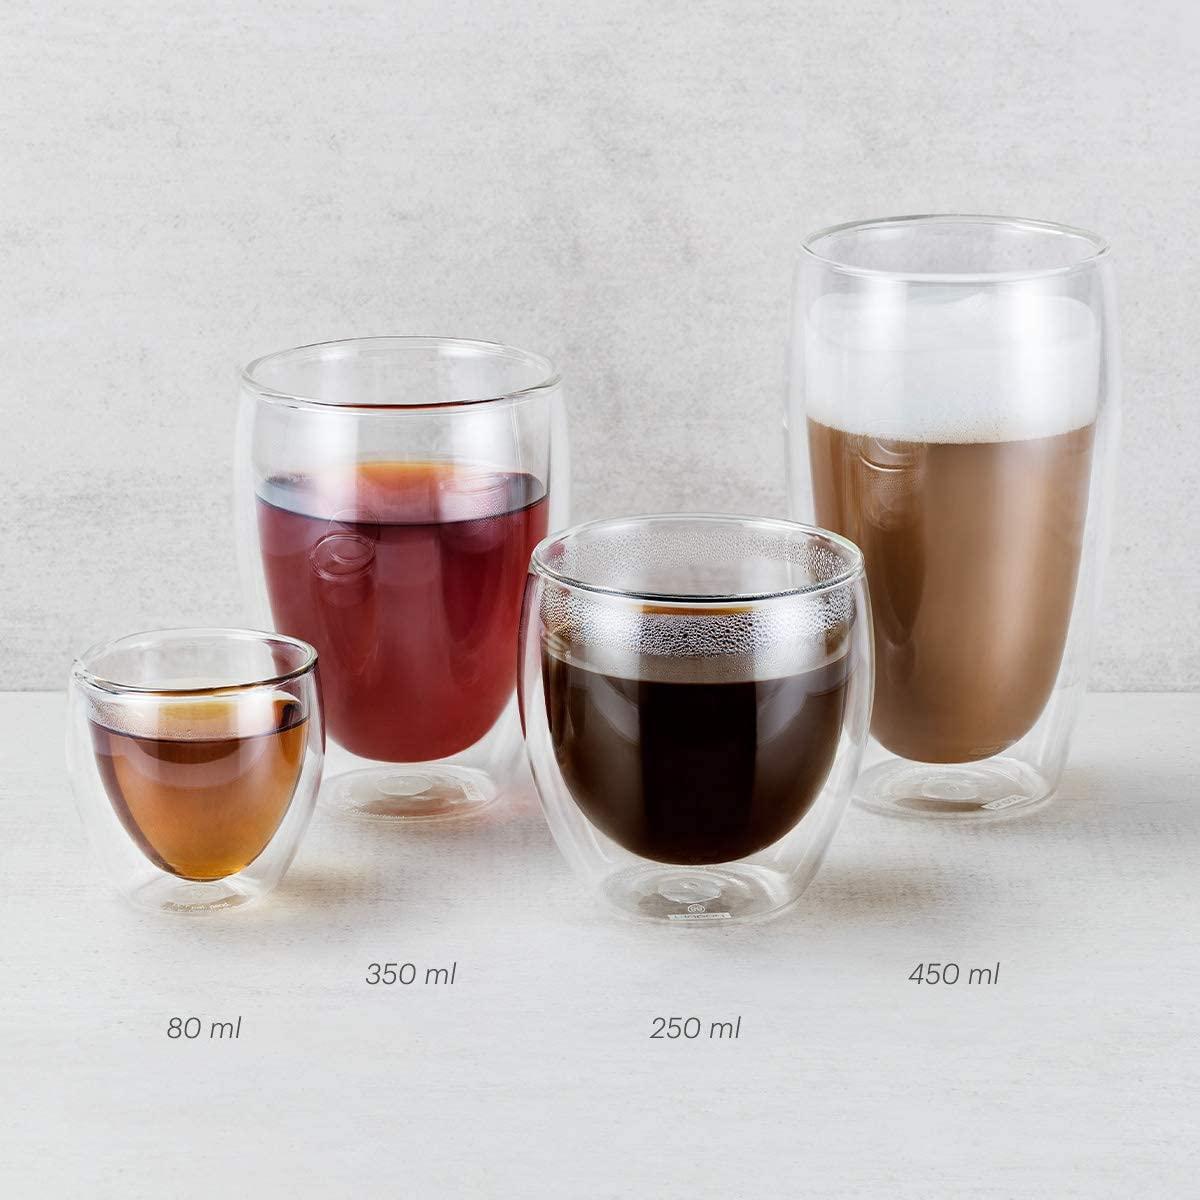 BODUM(ボダム) PAVINA ダブルウォールグラス 350ml 2個セット 4559-10Jの商品画像2